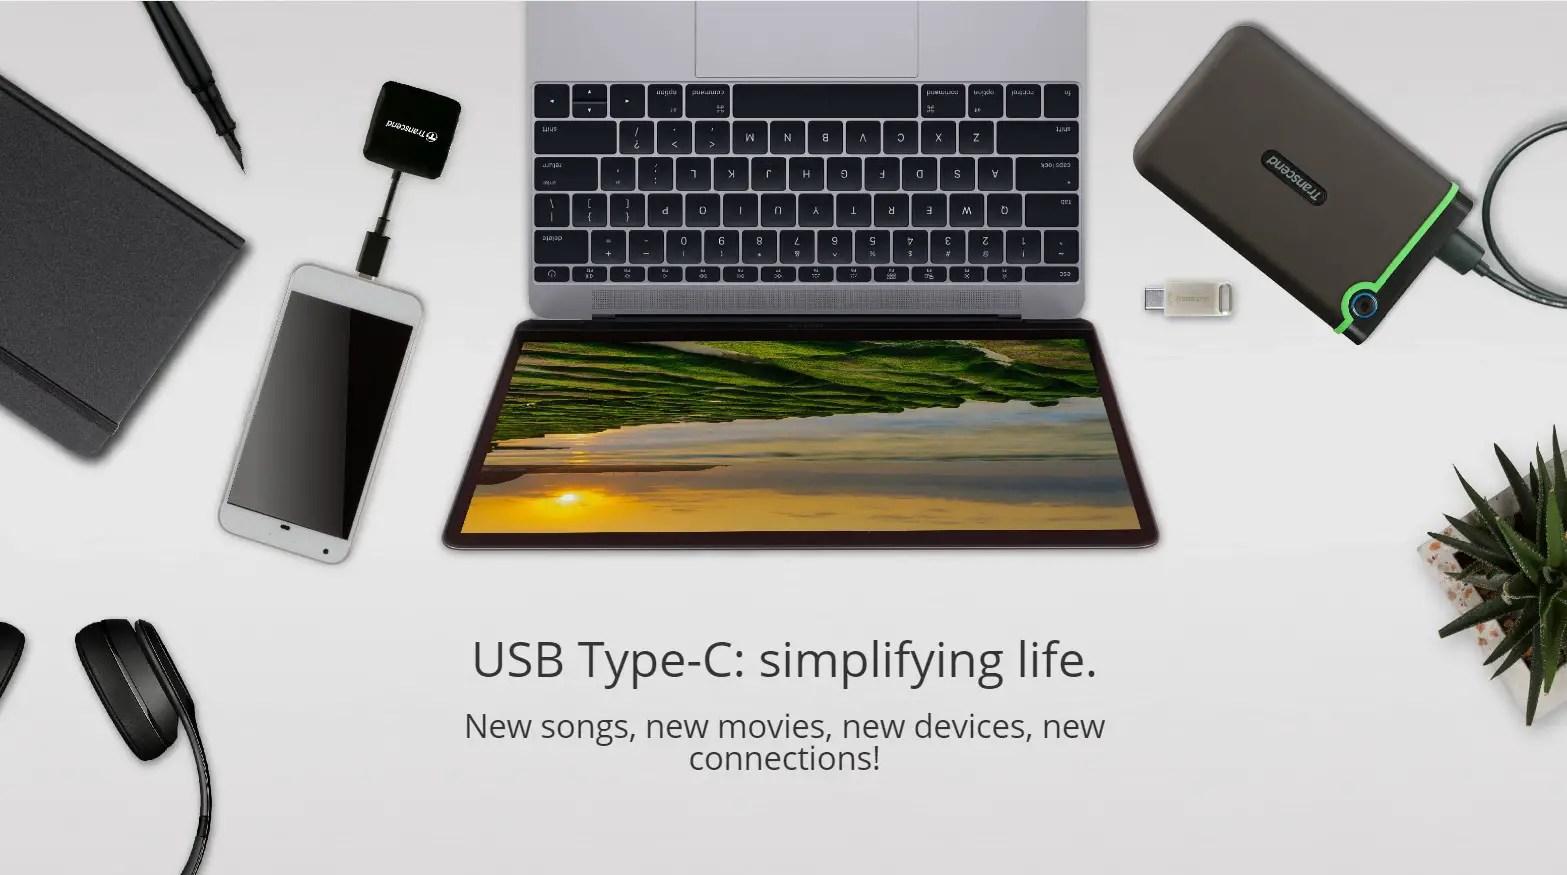 Transcend offers comprehensive solutions for USB Type-C standard